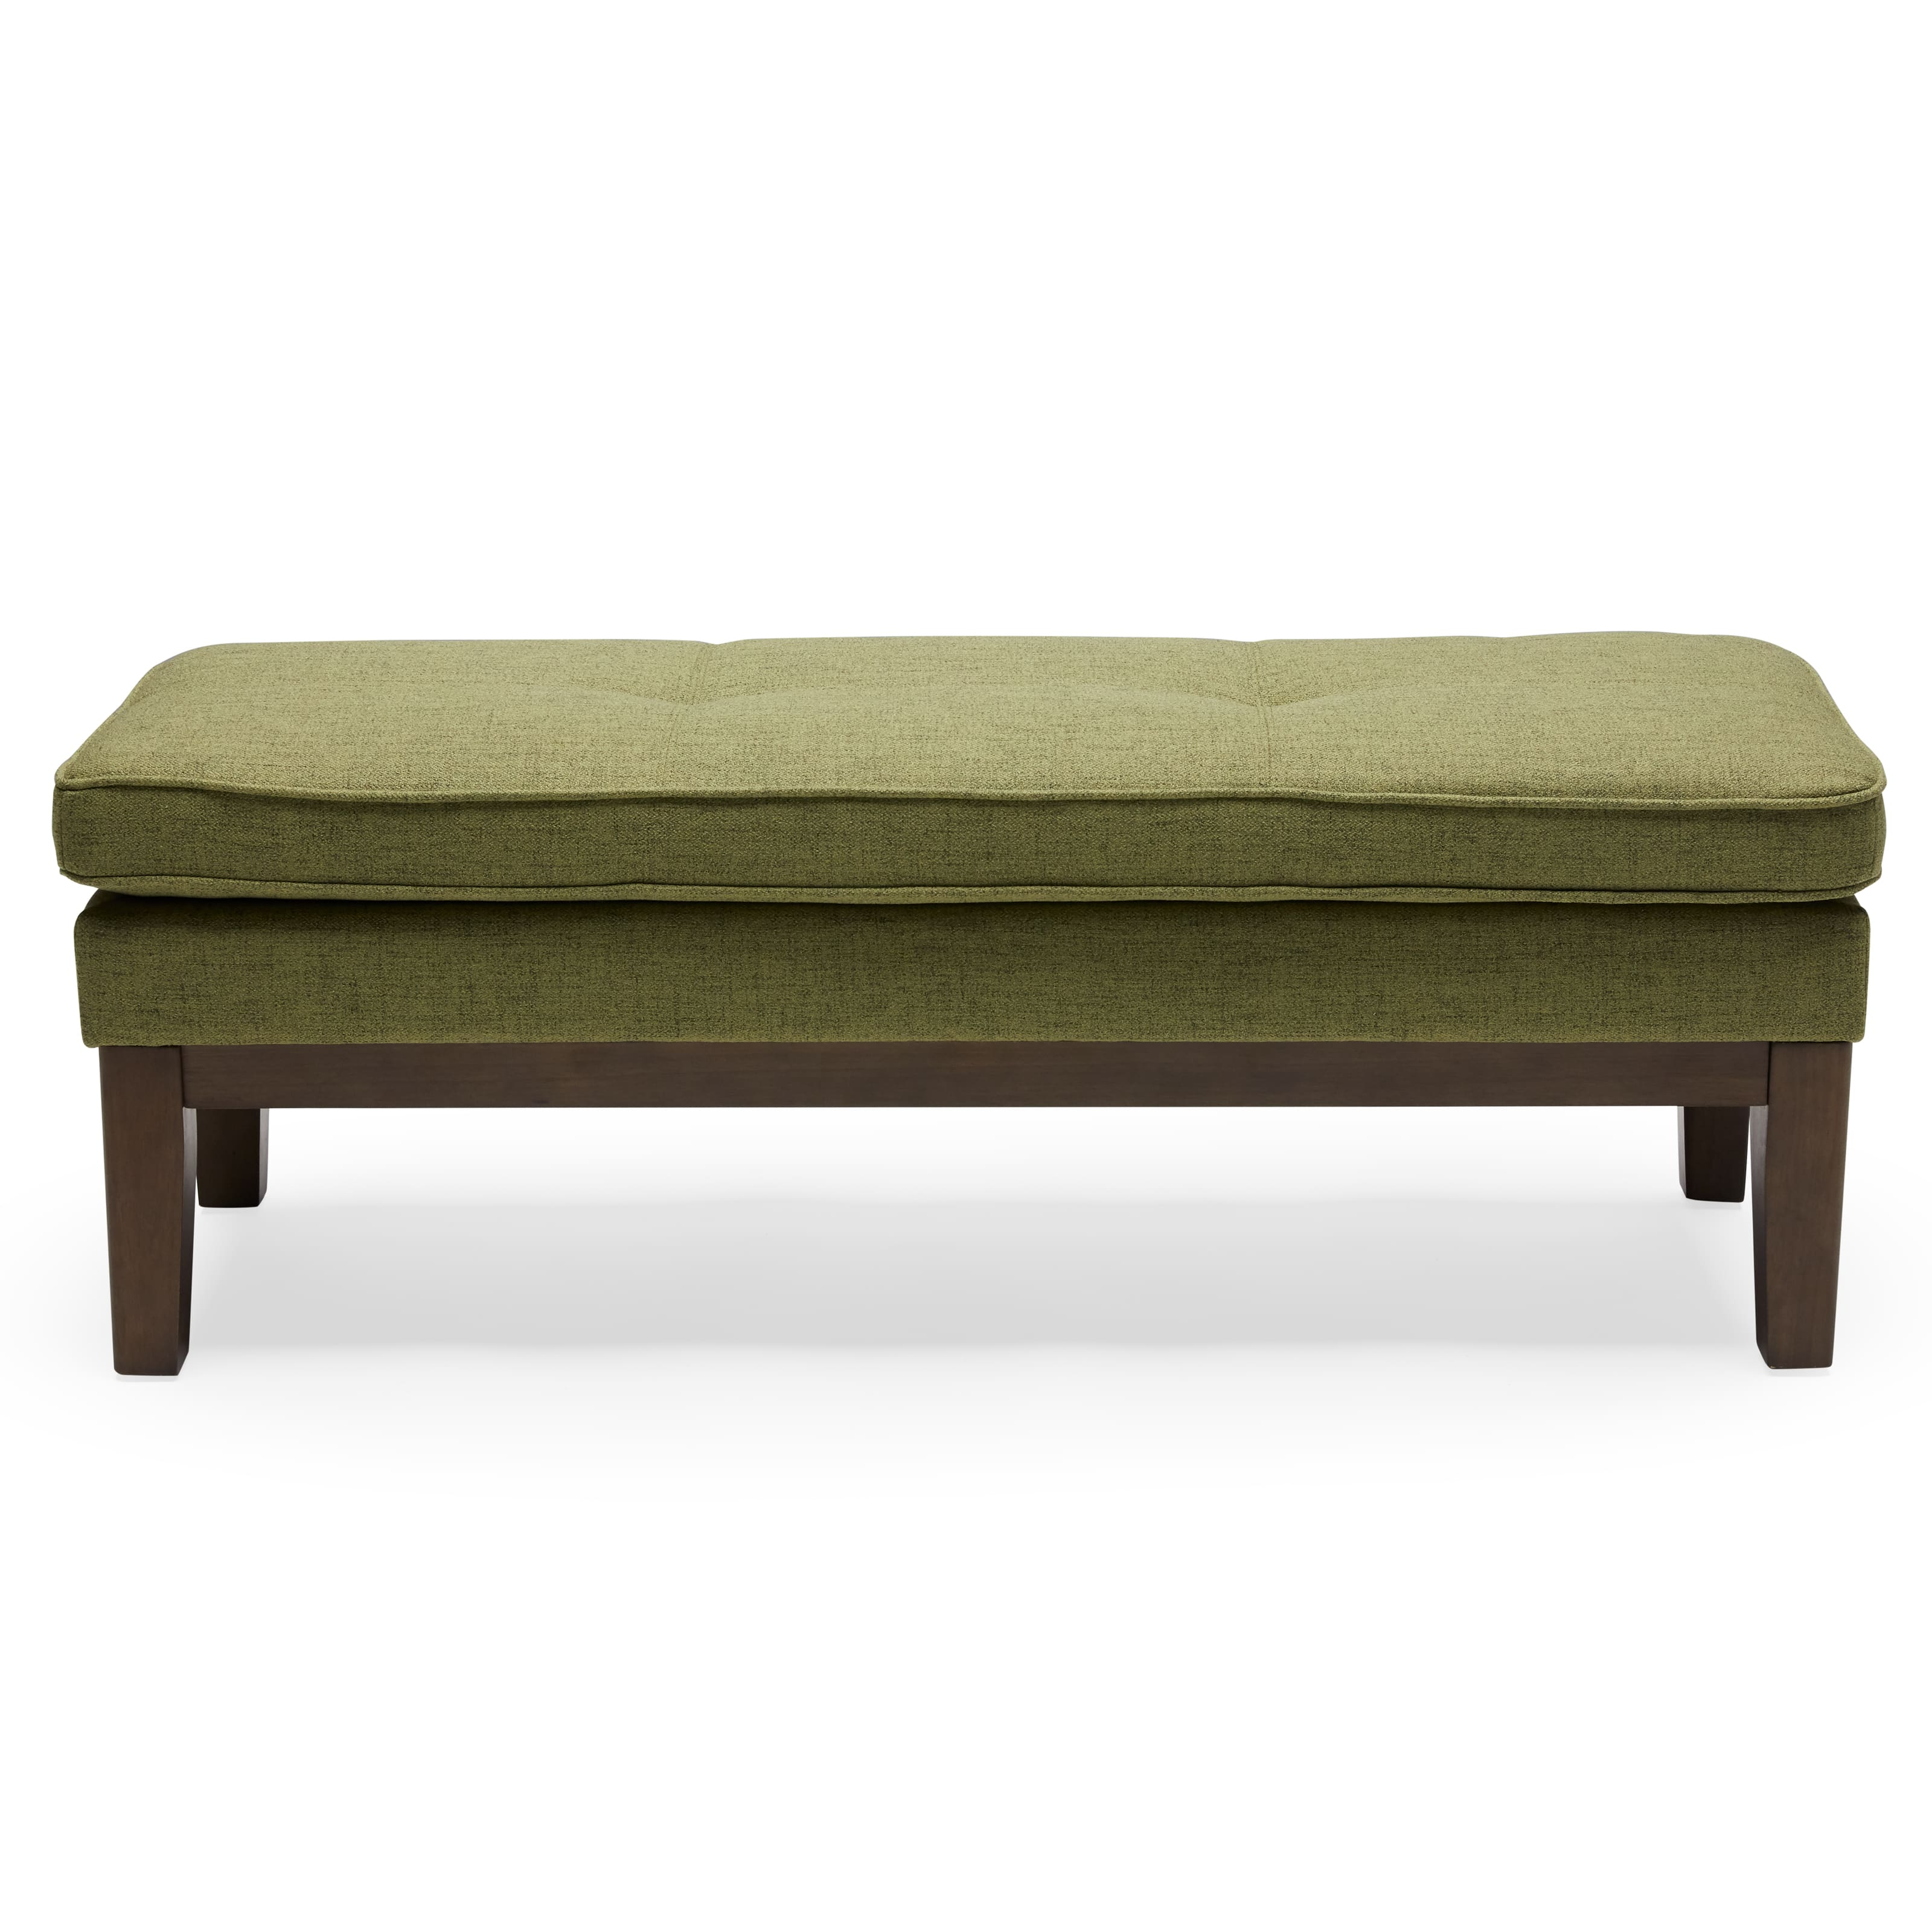 MoDRN Mid-Century Pullman Bench (green) $54 + Free shipping